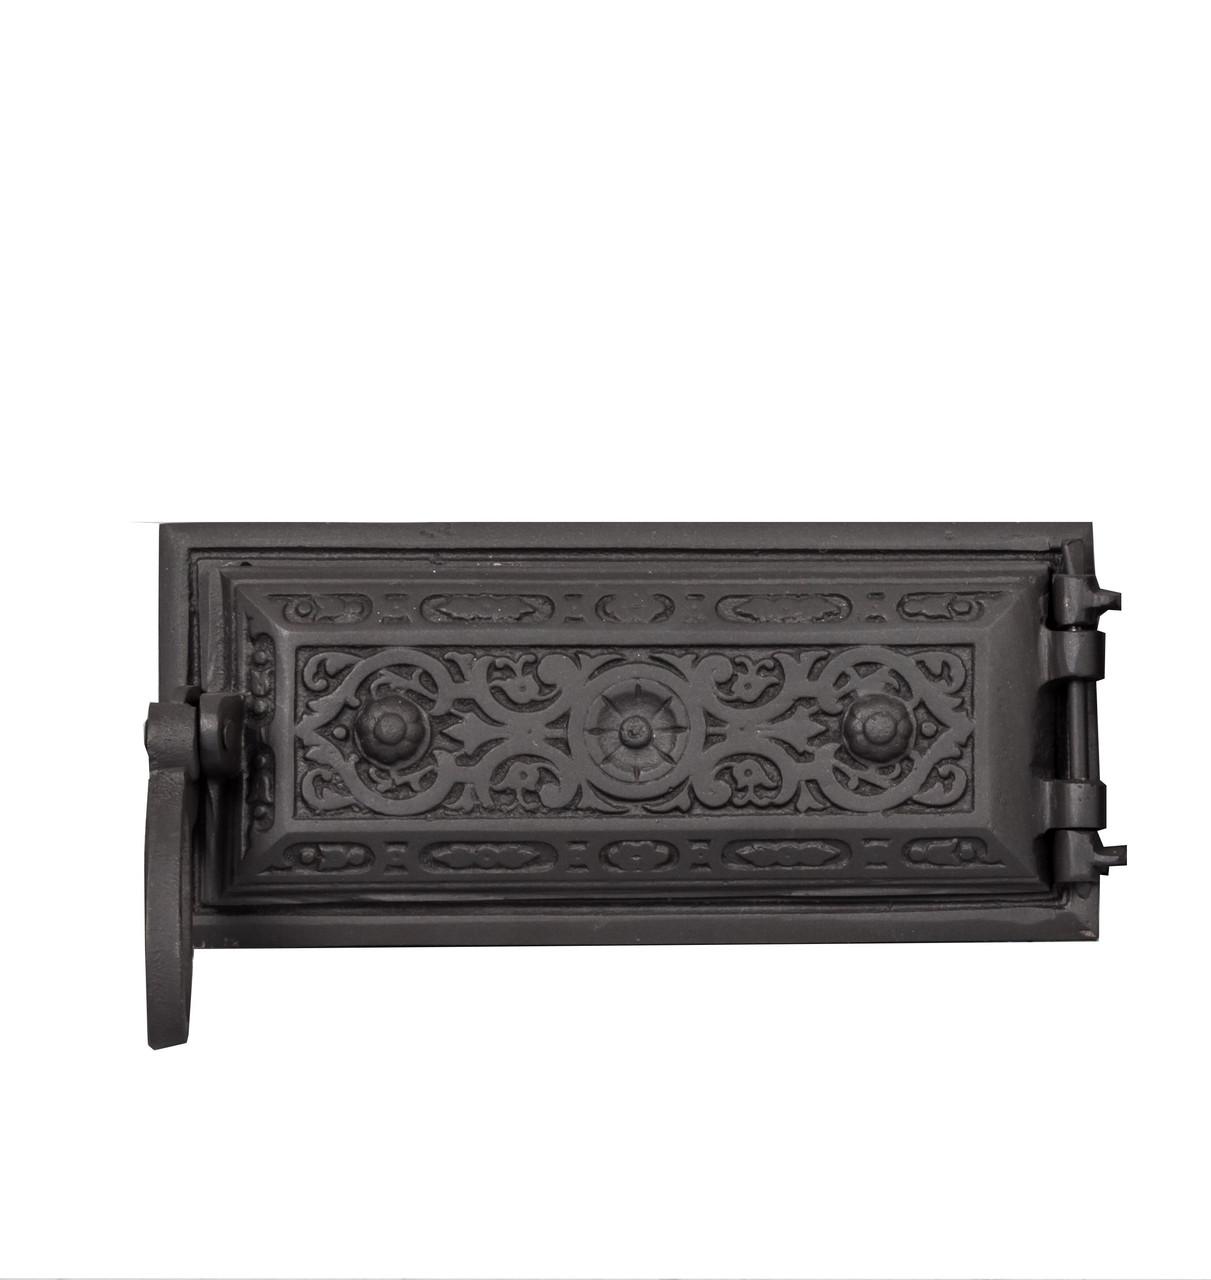 Зольні дверцята для печі з чавуну - Dunántúl 24 х 11 см/22 х 9см